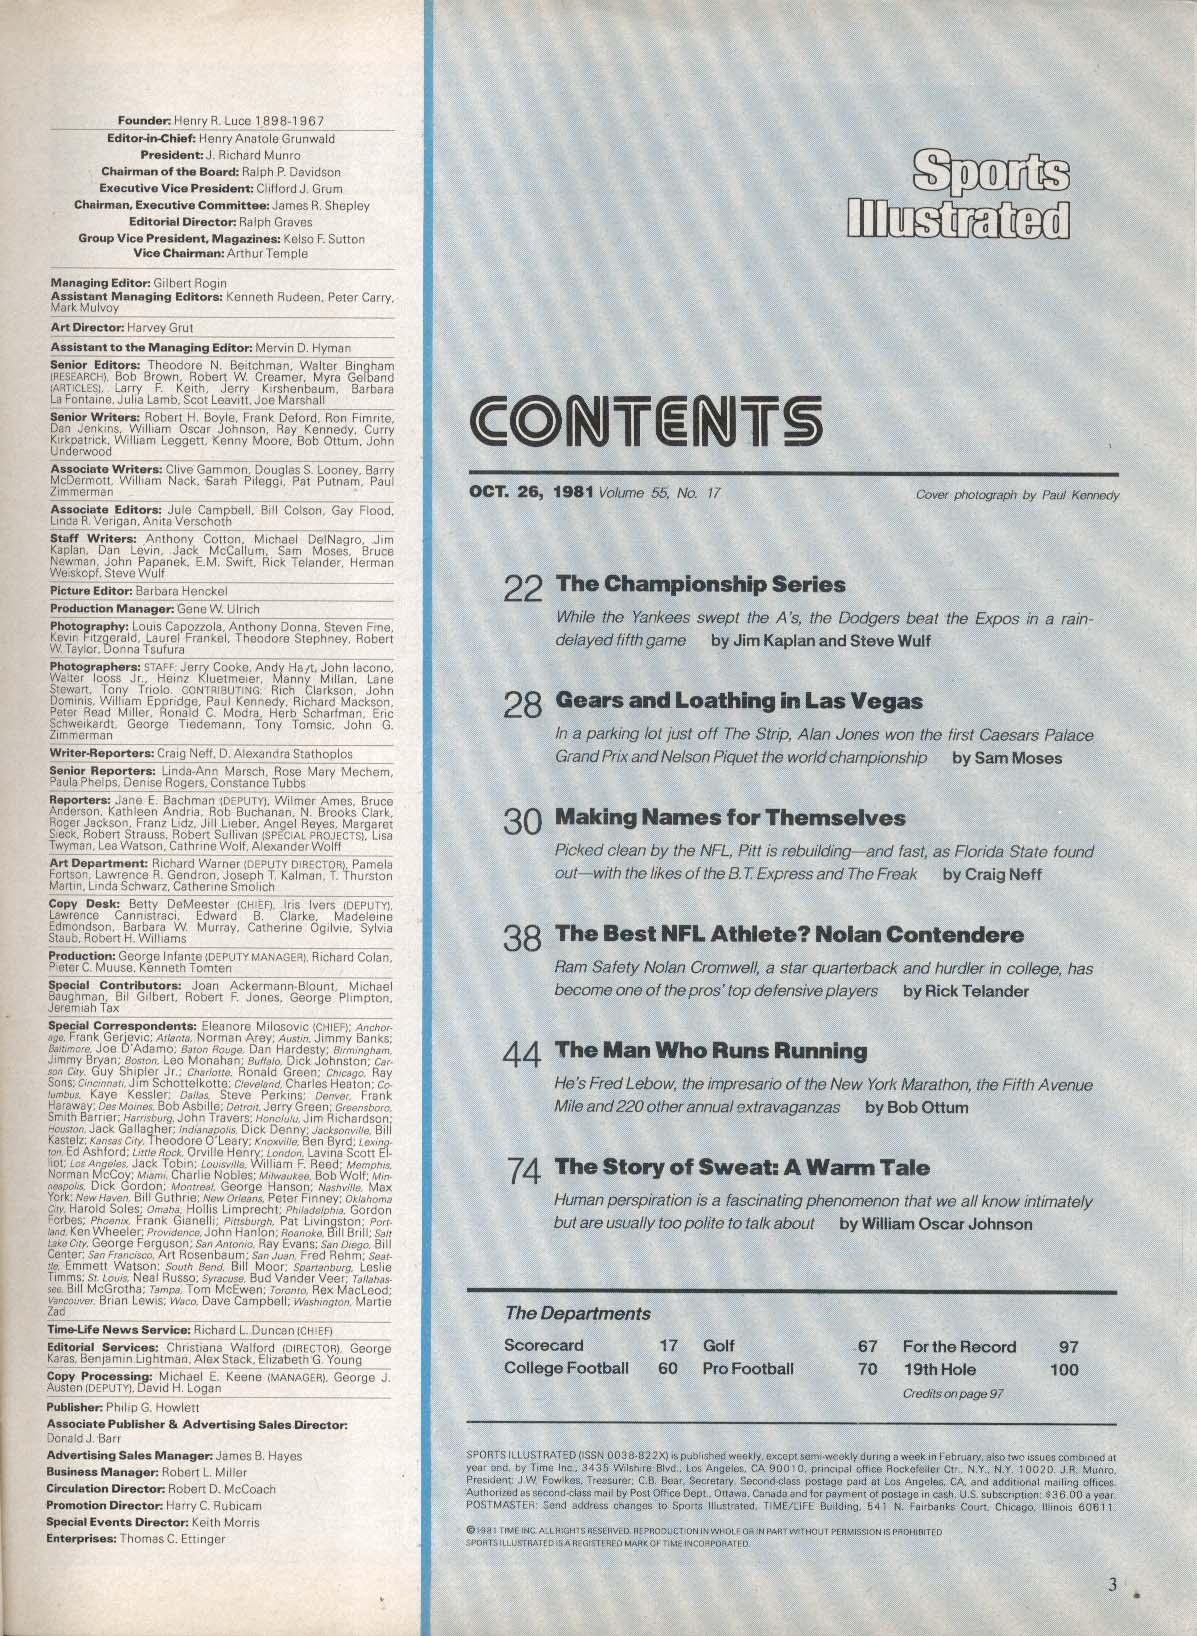 SPORTS ILLUSTRATED Graig Nettles Alan Jones Nolan Cromwell Fred Lebow 10/26 1981